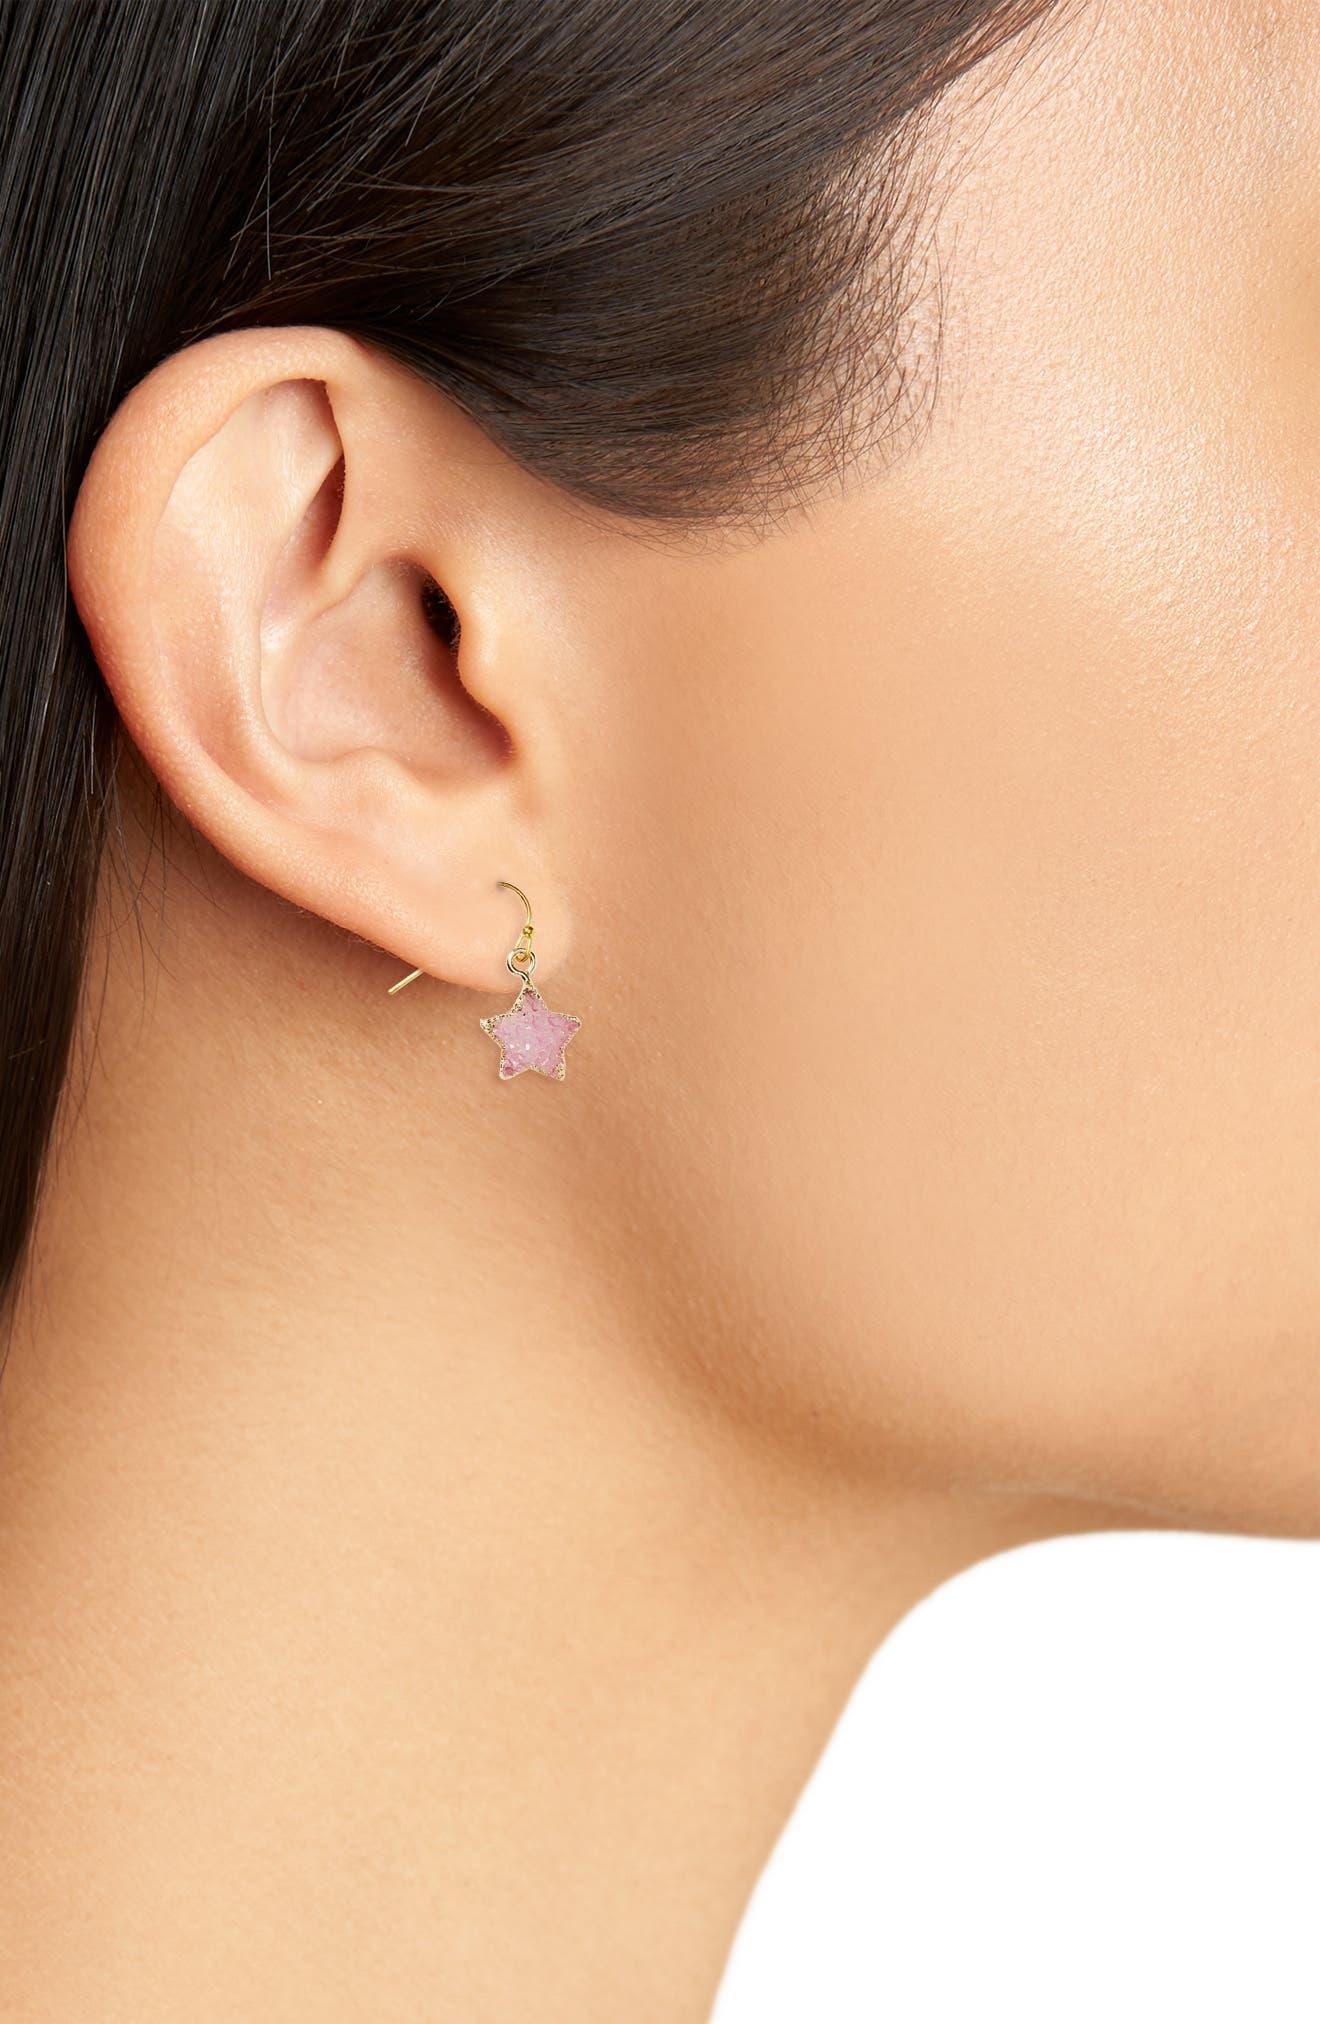 Moon & Star Drusy Stone Earrings,                             Alternate thumbnail 2, color,